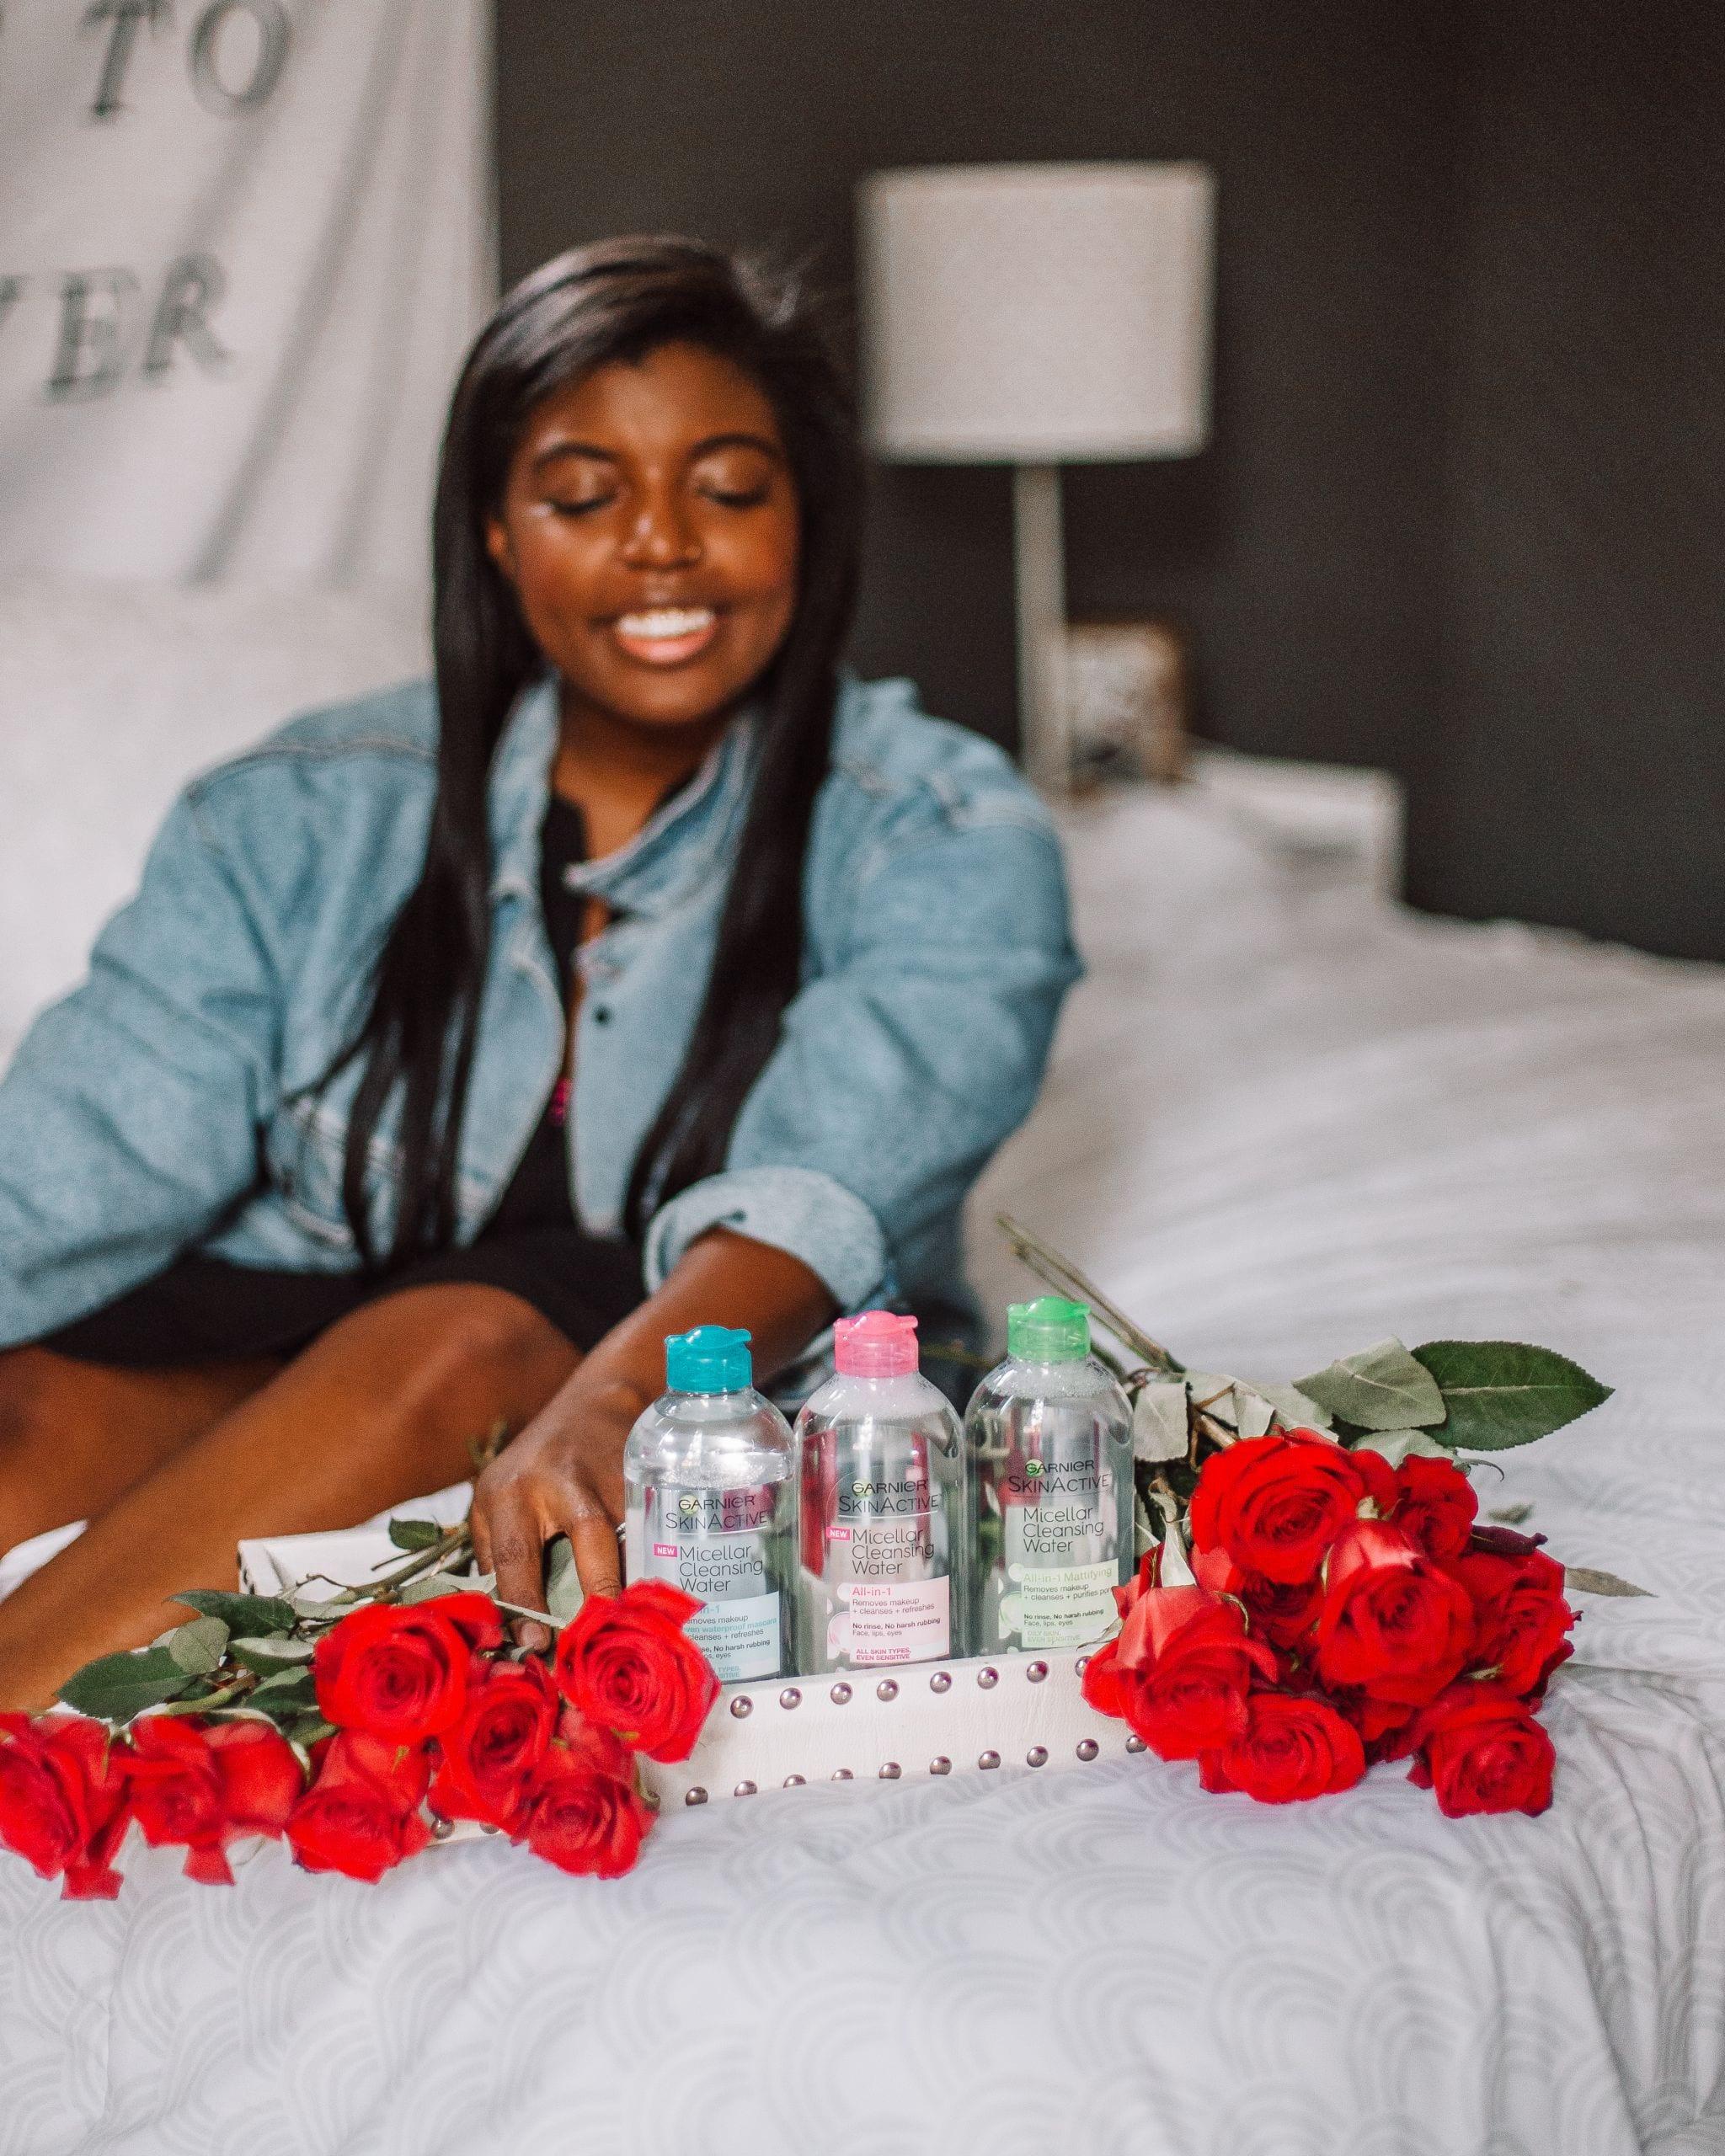 Blogger poses with Garnier Micellar water